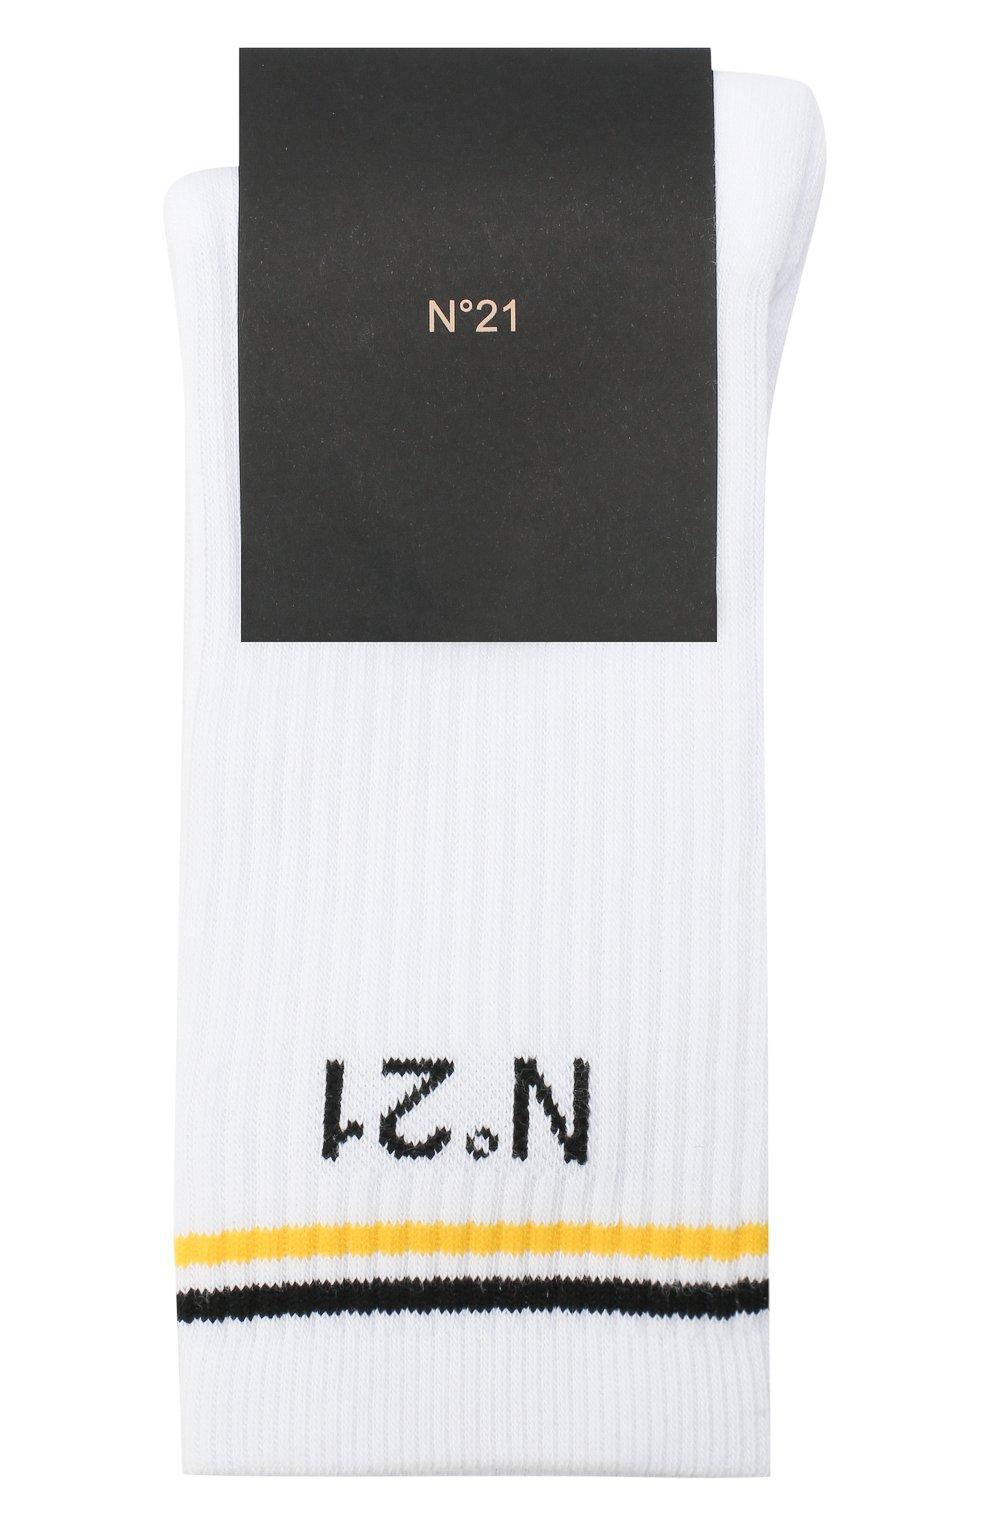 Детские хлопковые носки N21 белого цвета, арт. N214A4/N0027/N21Z4U   Фото 1 (Материал: Текстиль, Хлопок)